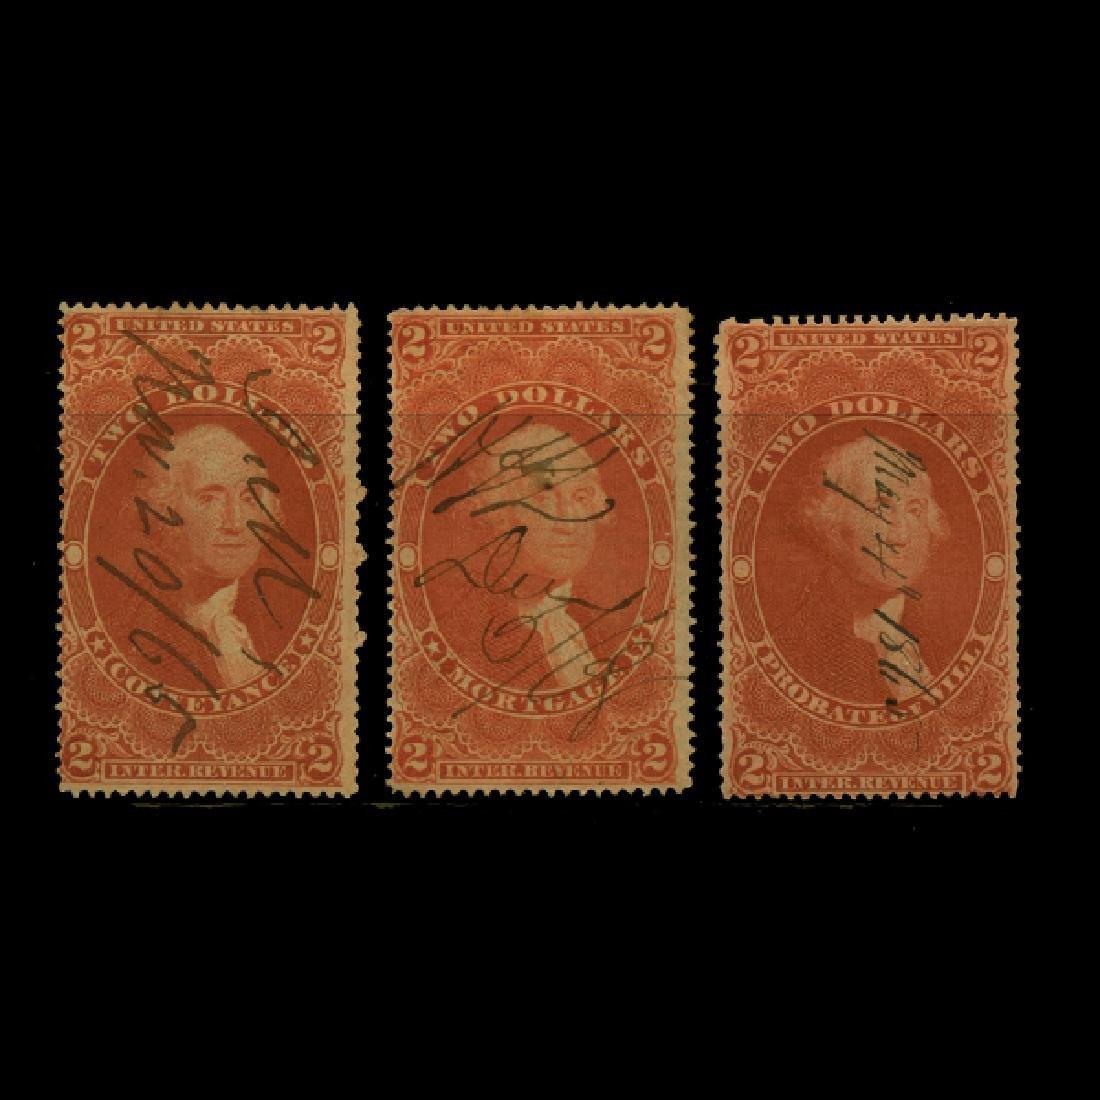 1861 US $2 Revenue Stamp Set 3pcs